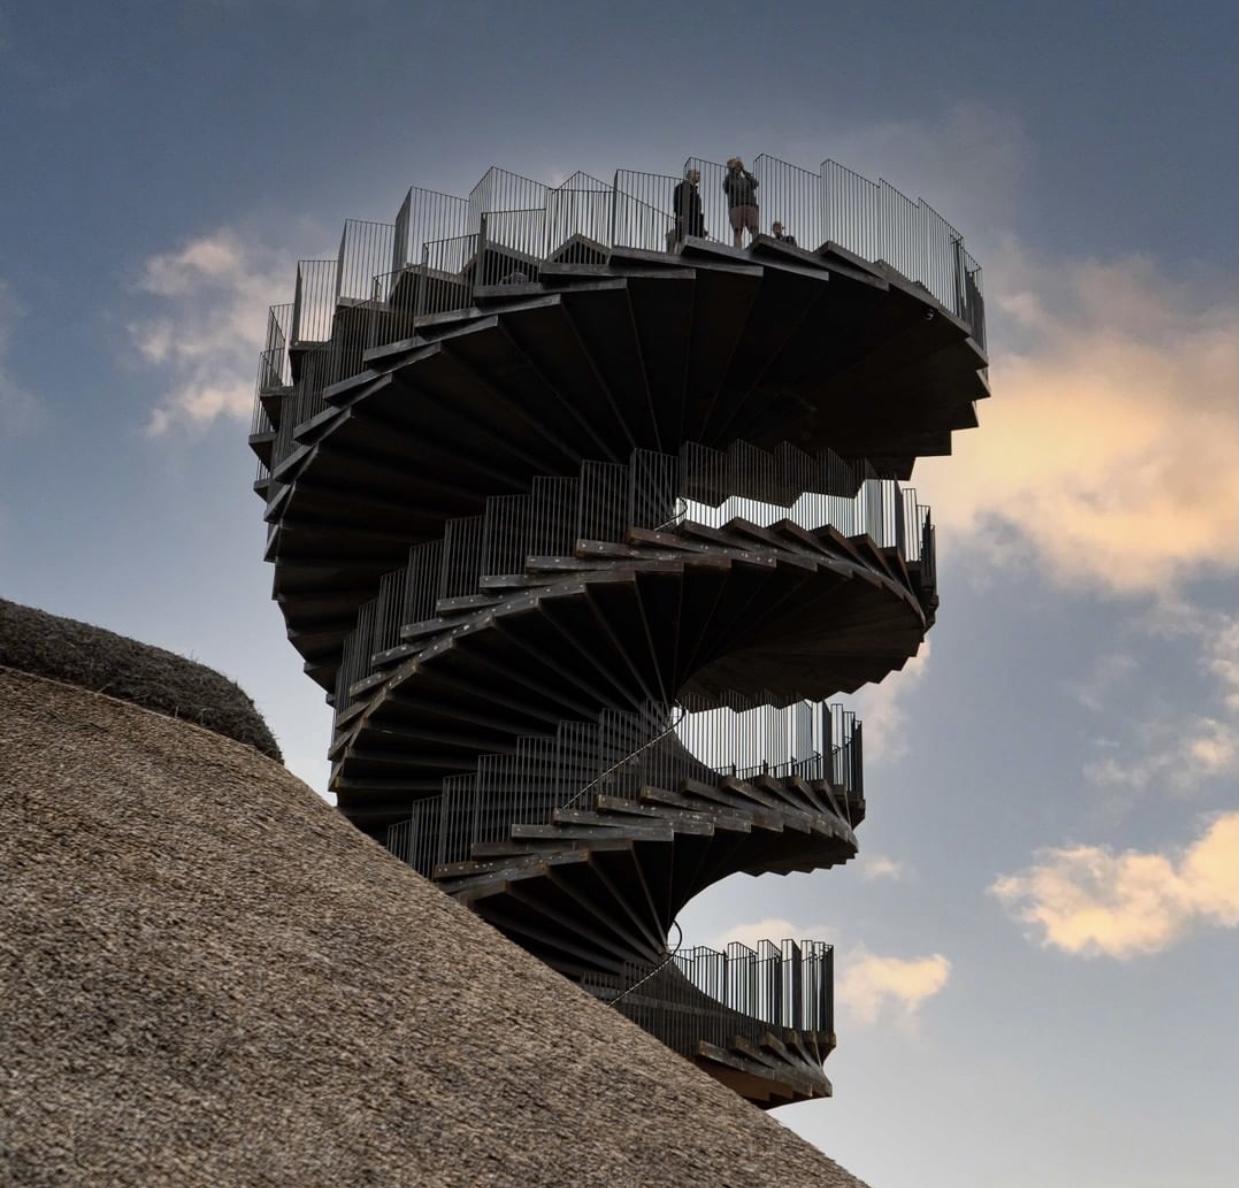 Double Helix - Marsk Tower